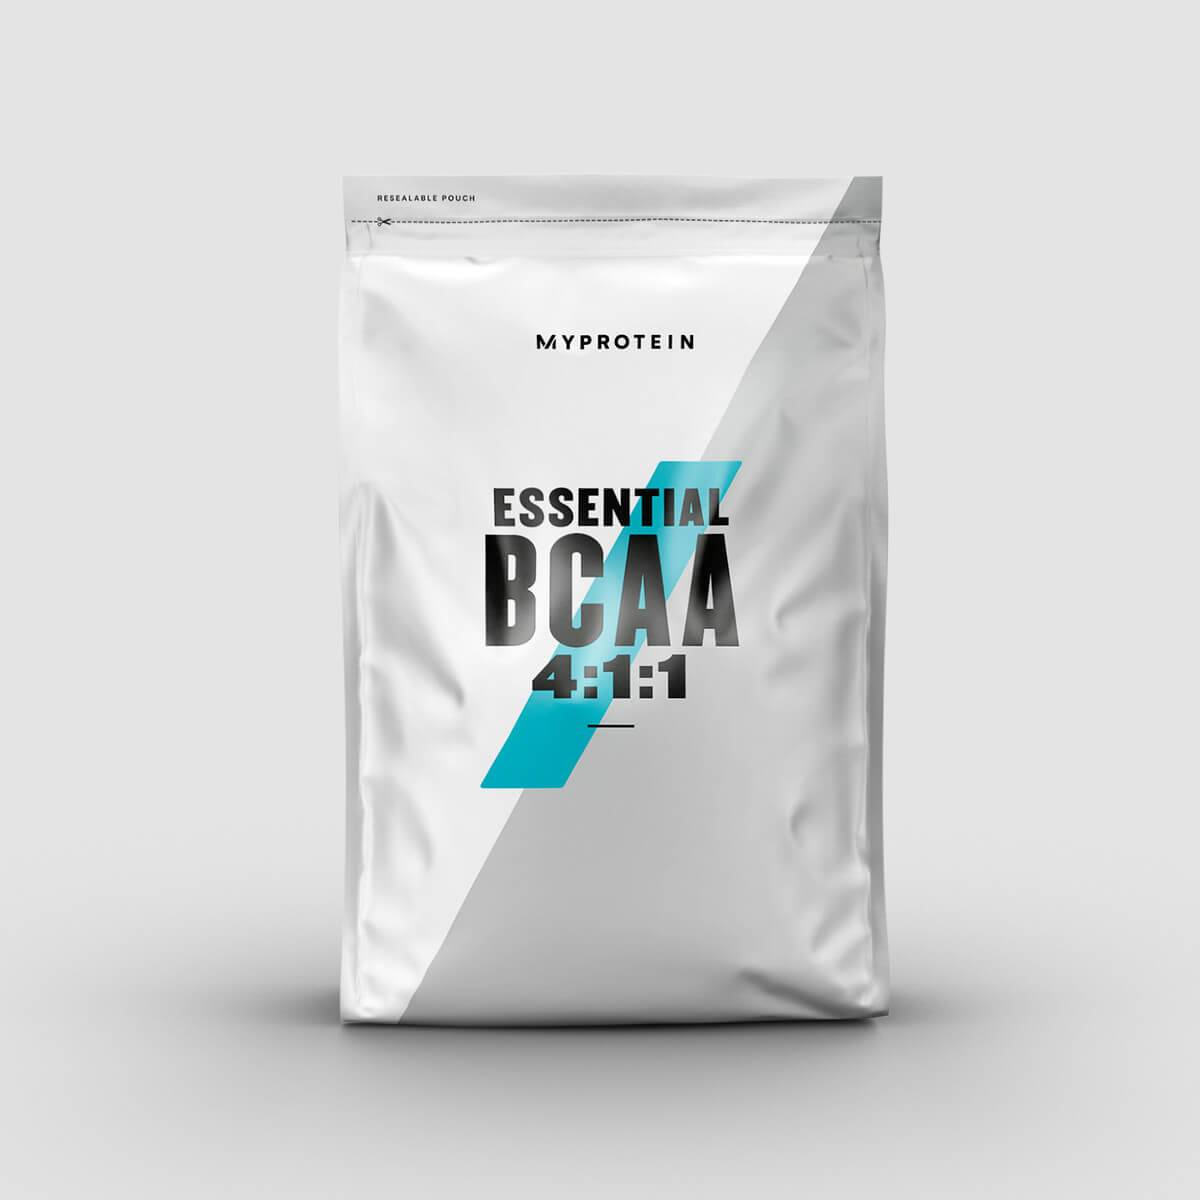 Myprotein BCAA 4:1:1 en poudre - 1kg - Sans arôme ajouté